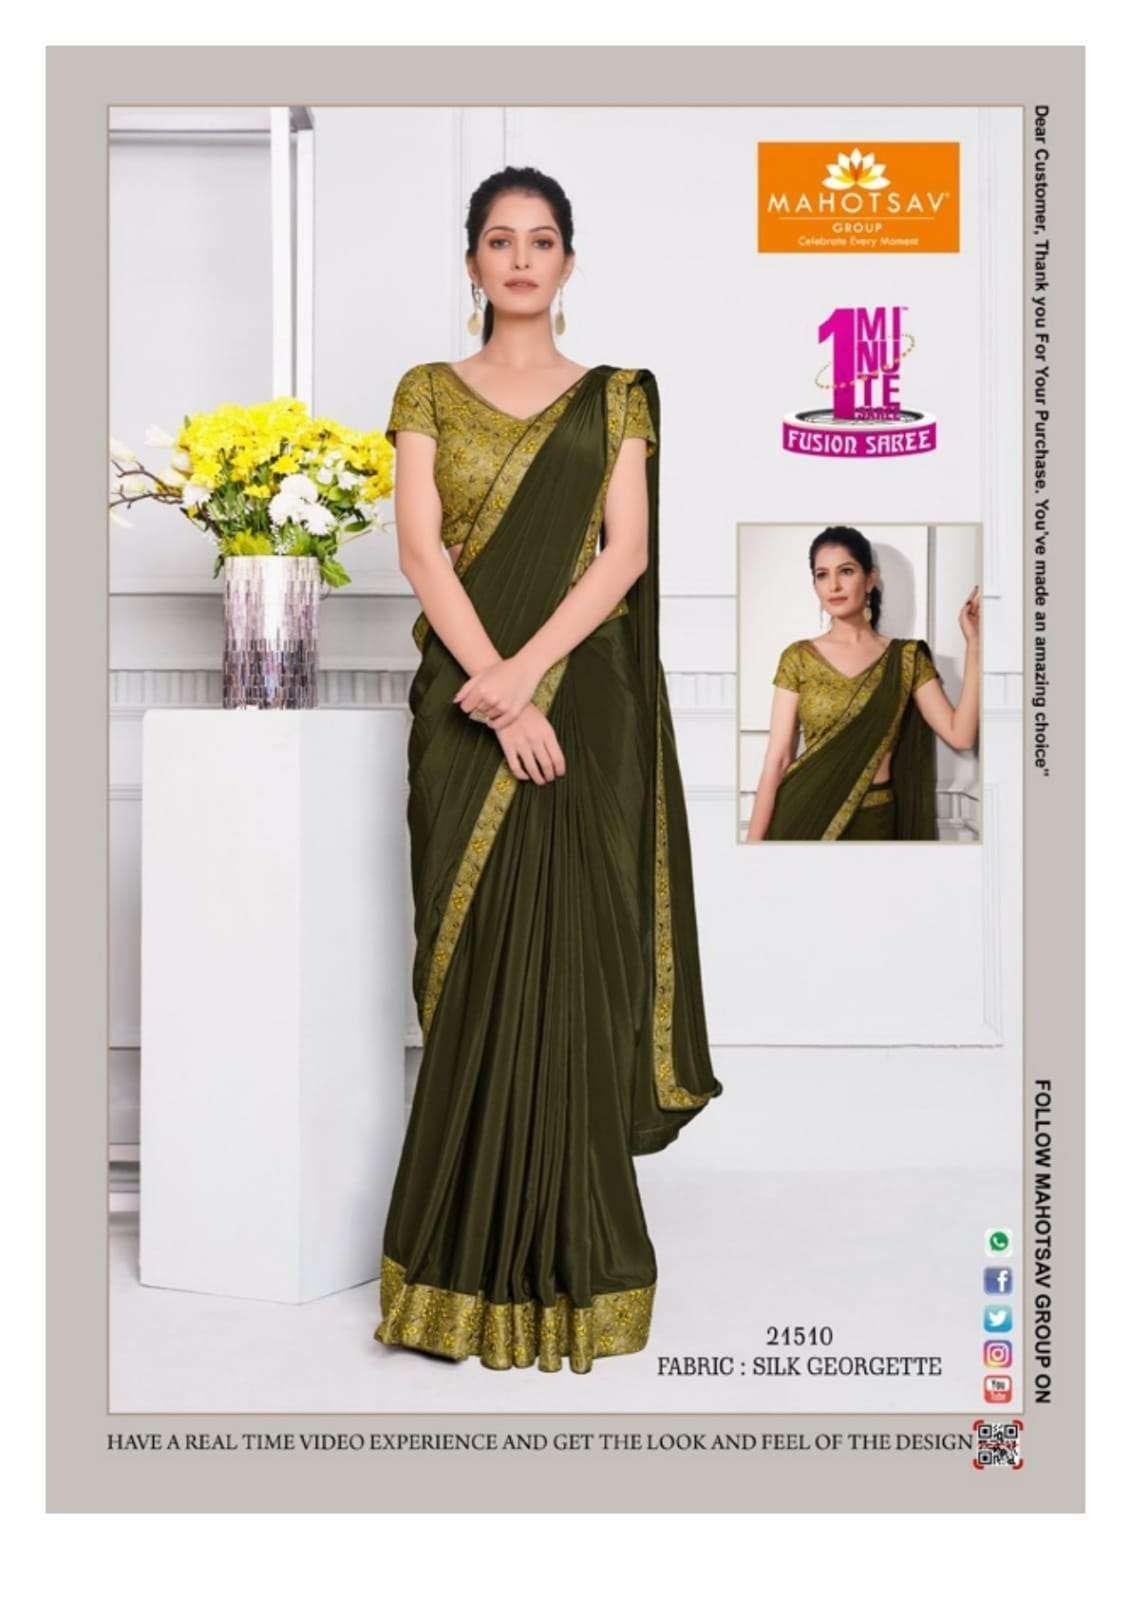 Mahotsav Moh Manthan Izzara 21501 To 215018 Series Fancy Designer Sarees Collection 21510